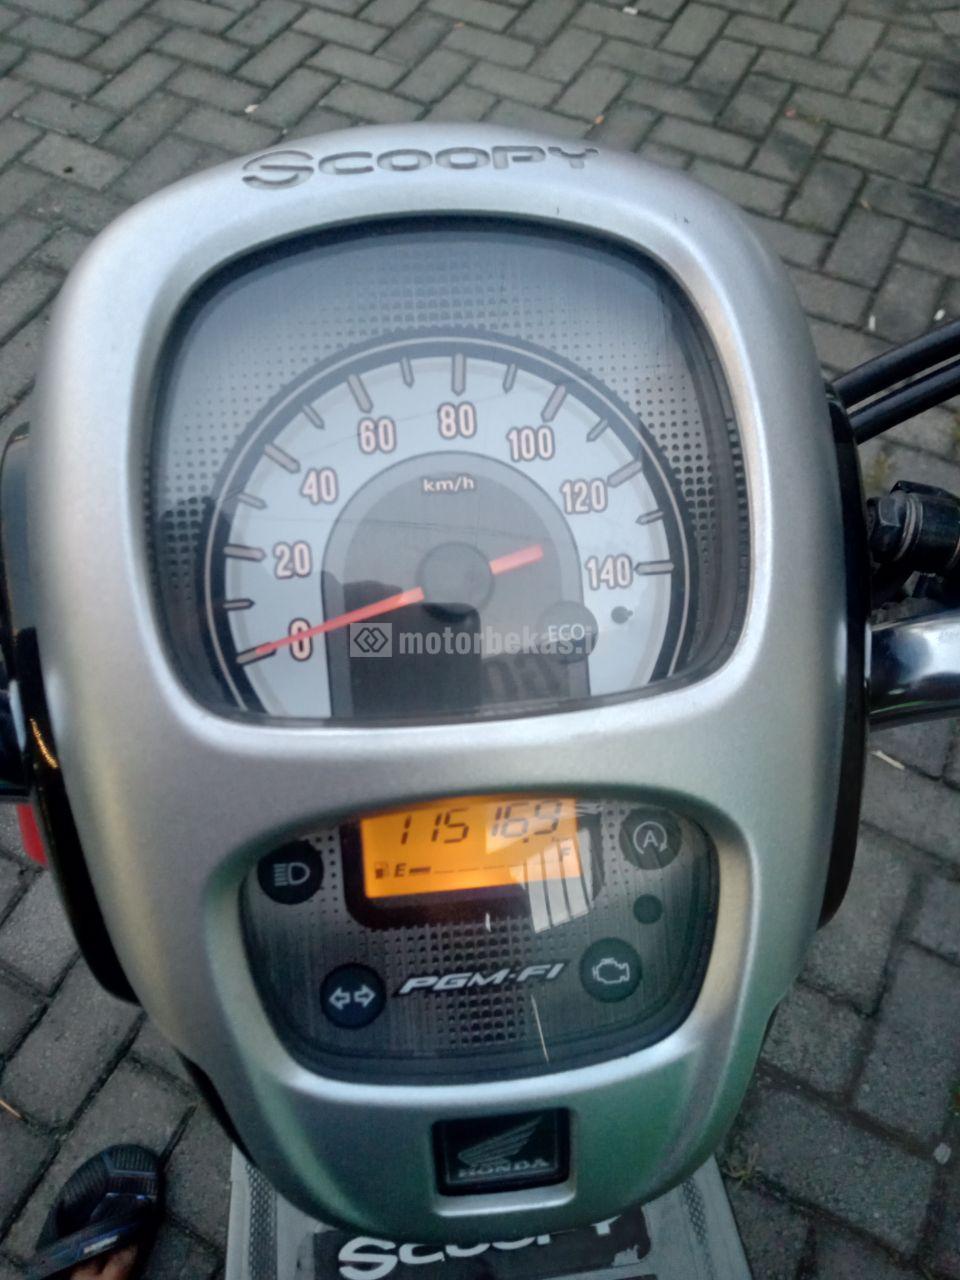 HONDA SCOOPY FI 2203 motorbekas.id